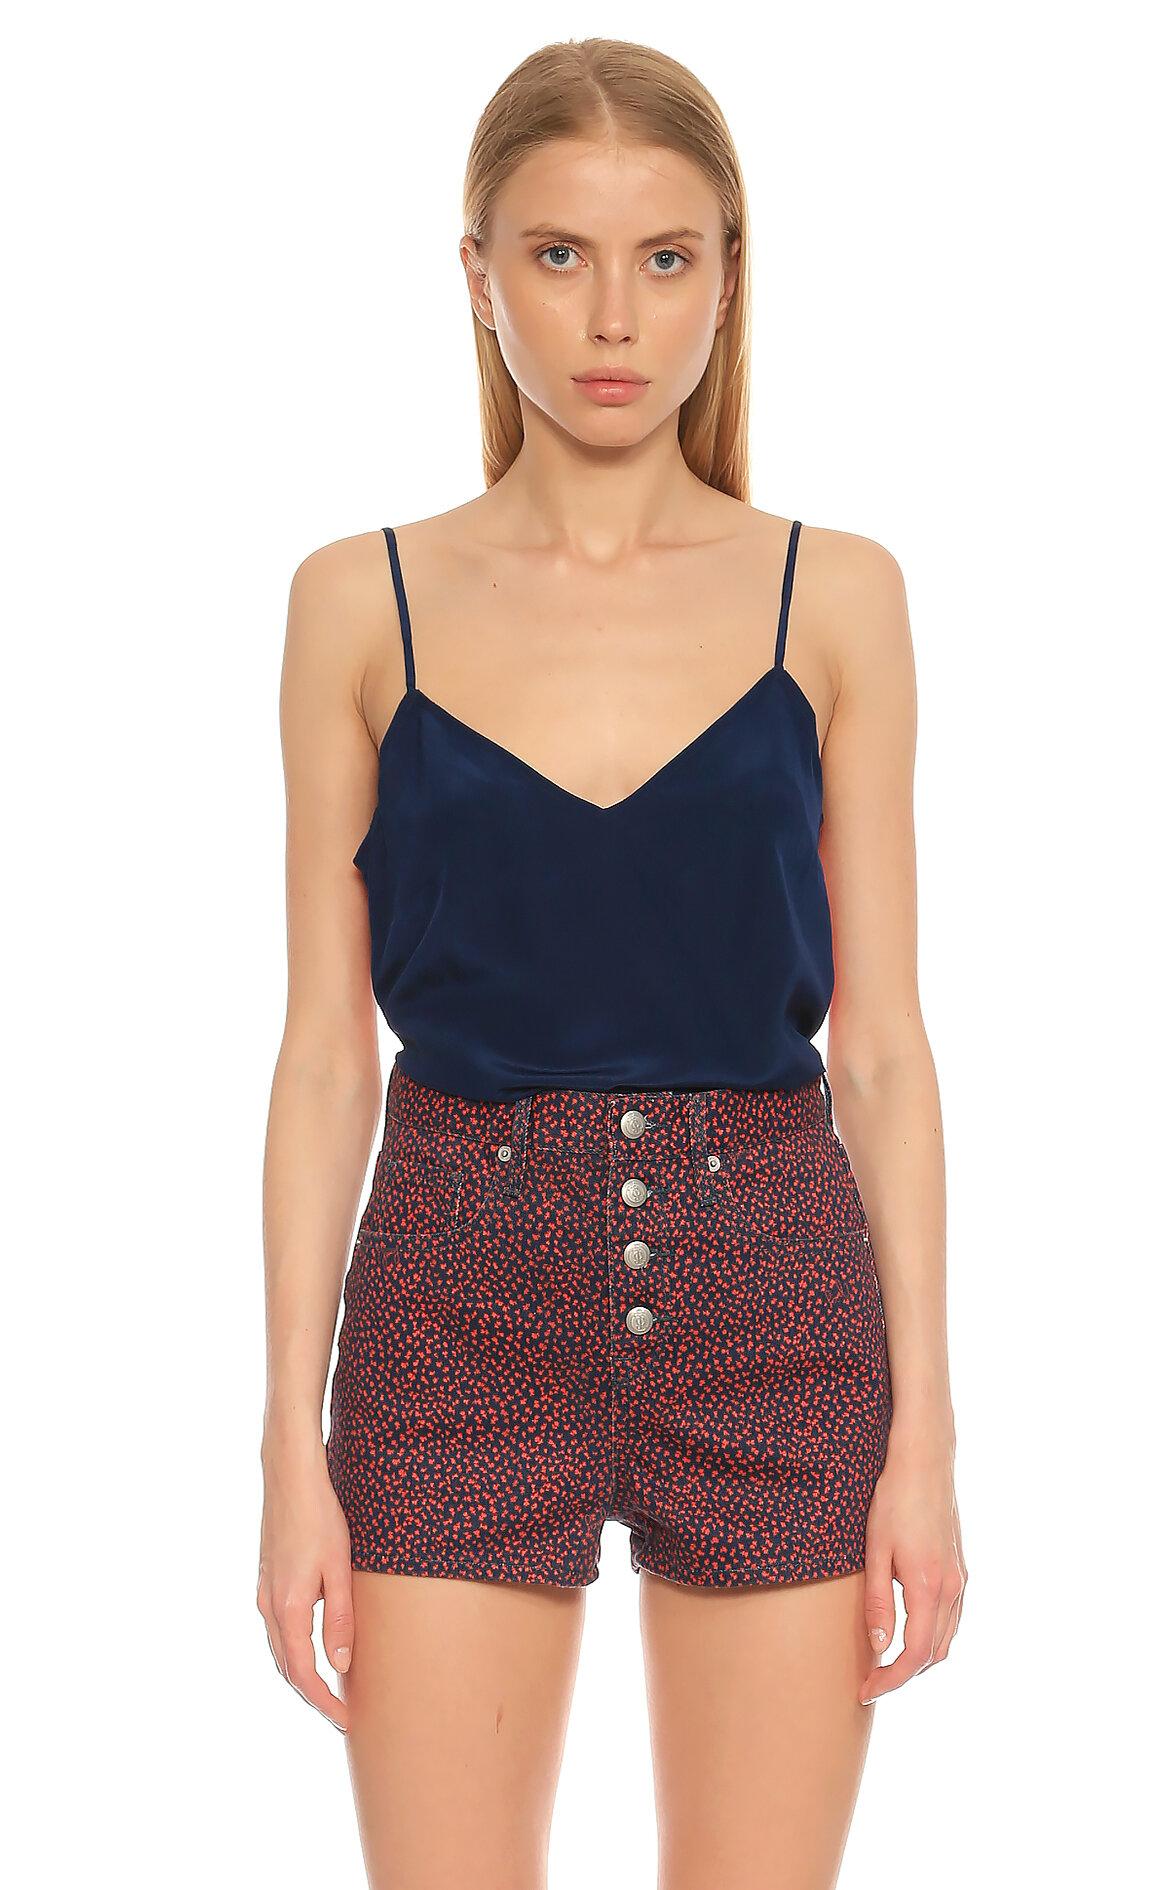 Juicy Couture-Juicy Couture Bluz